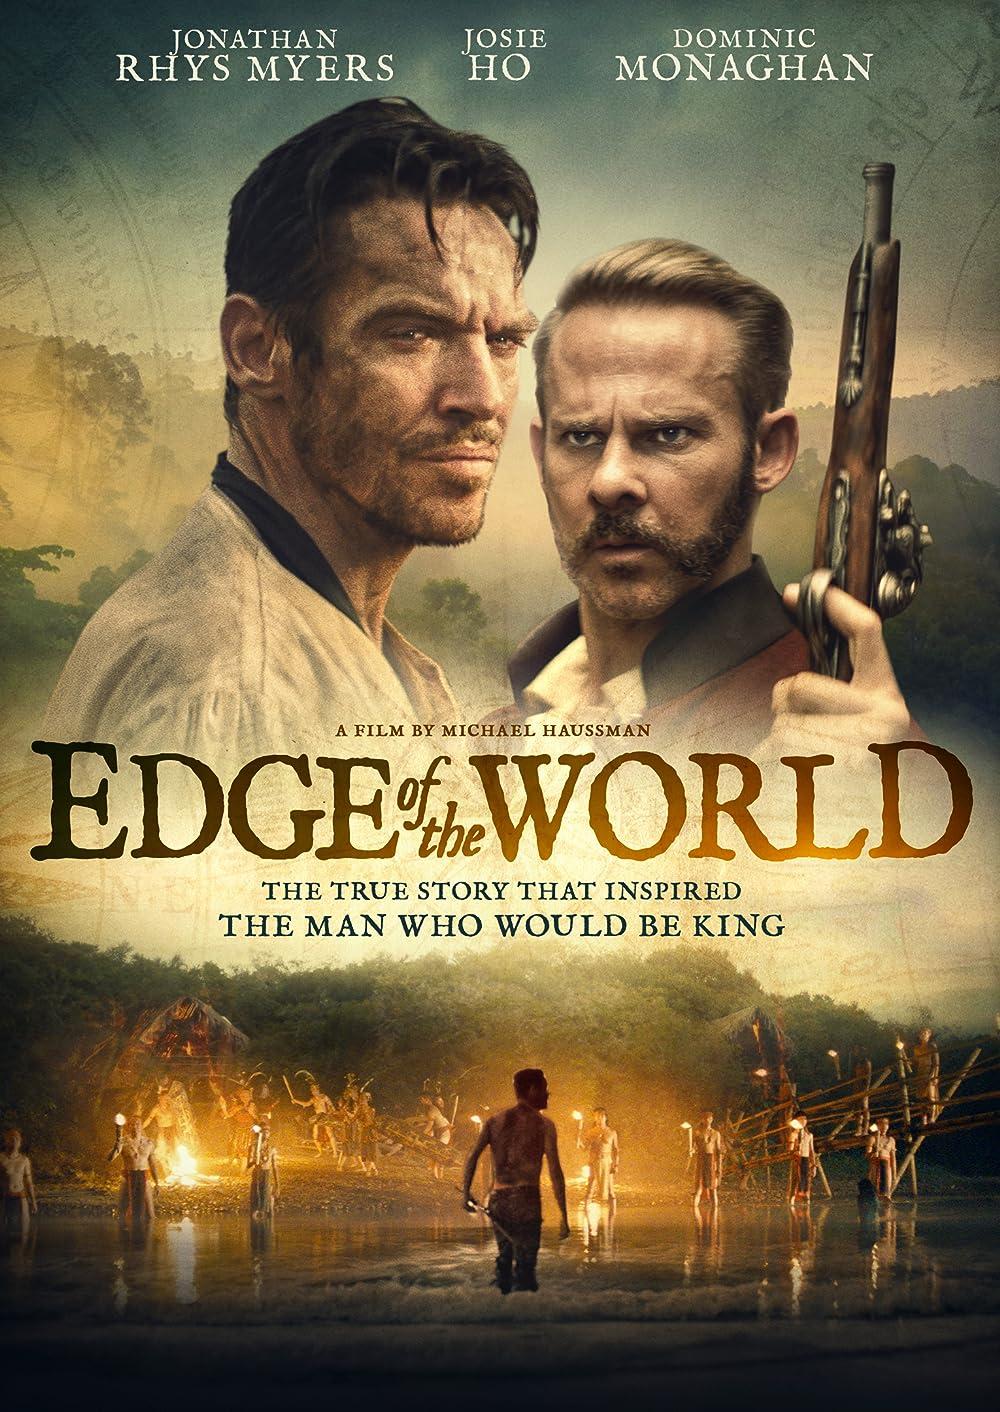 Edge of the World 2021 English 720p HDRip 800MB Download